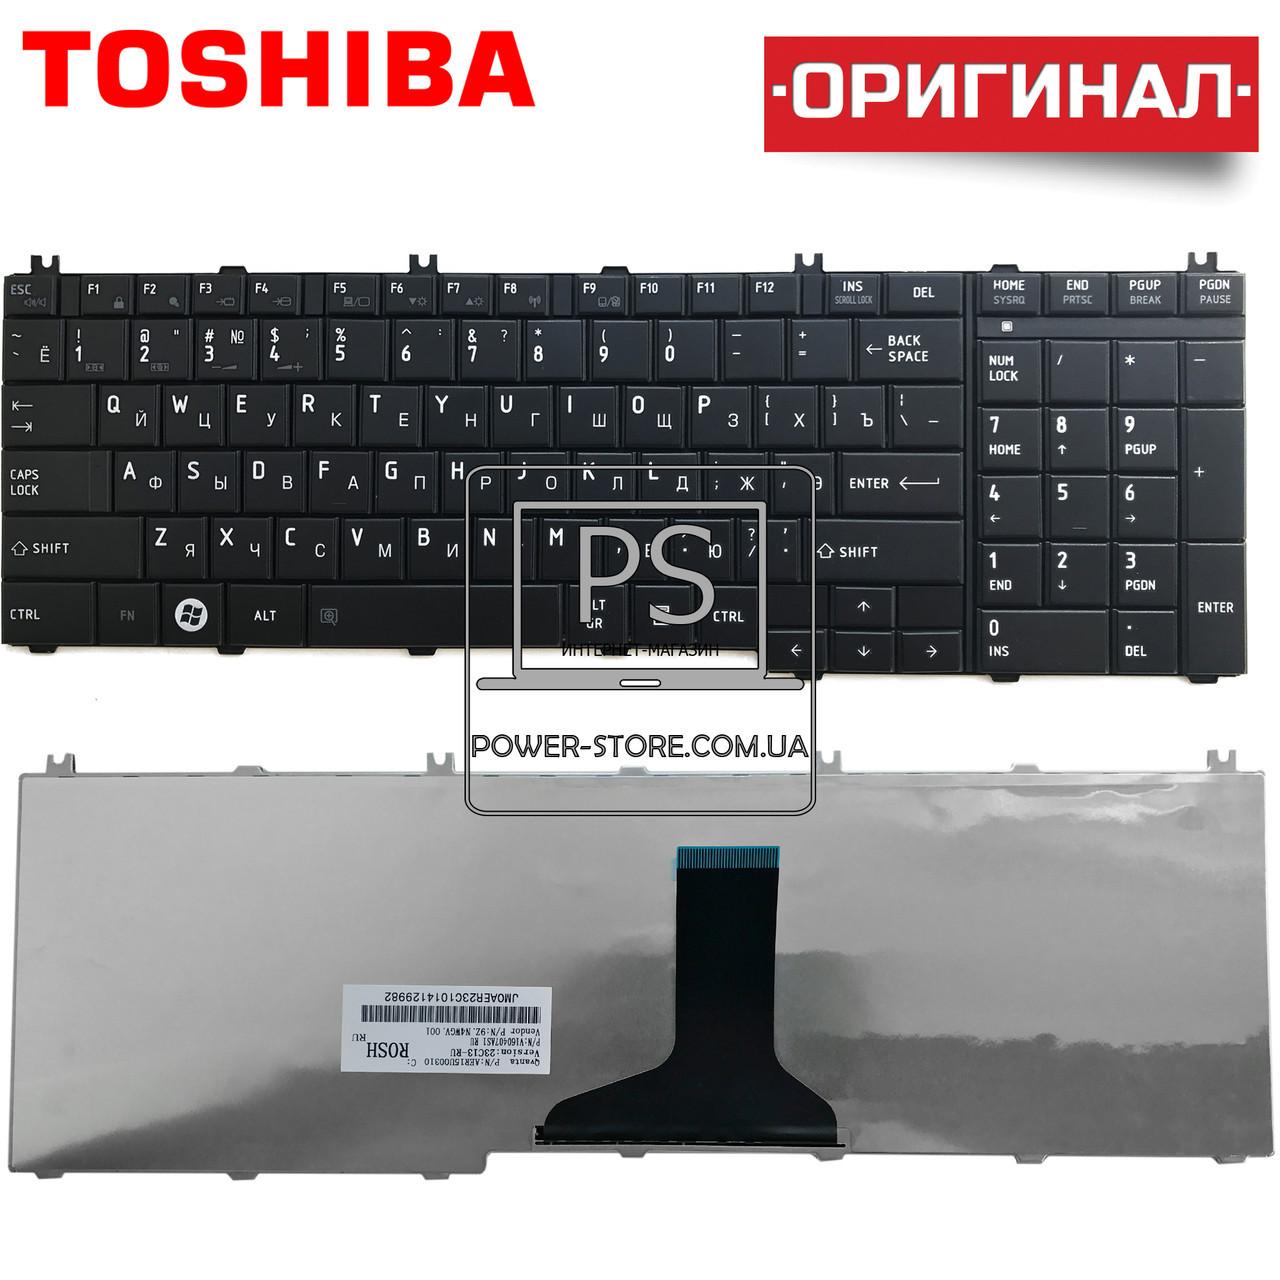 Клавиатура  для ноутбука TOSHIBA L755d-s5204, L755d-s5241, L755-s5216, L755-s5245, L755-s5358,